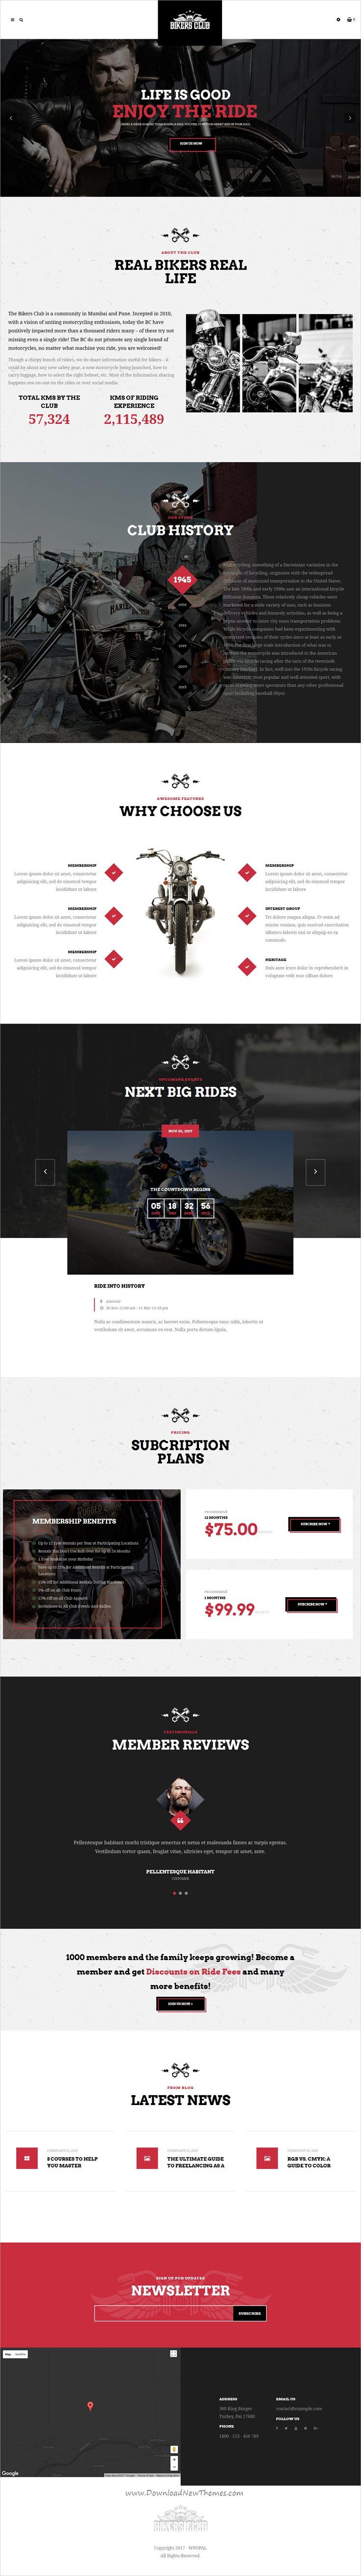 Bikersclub - Motorcycle Responsive WordPress Theme   Wordpress ...